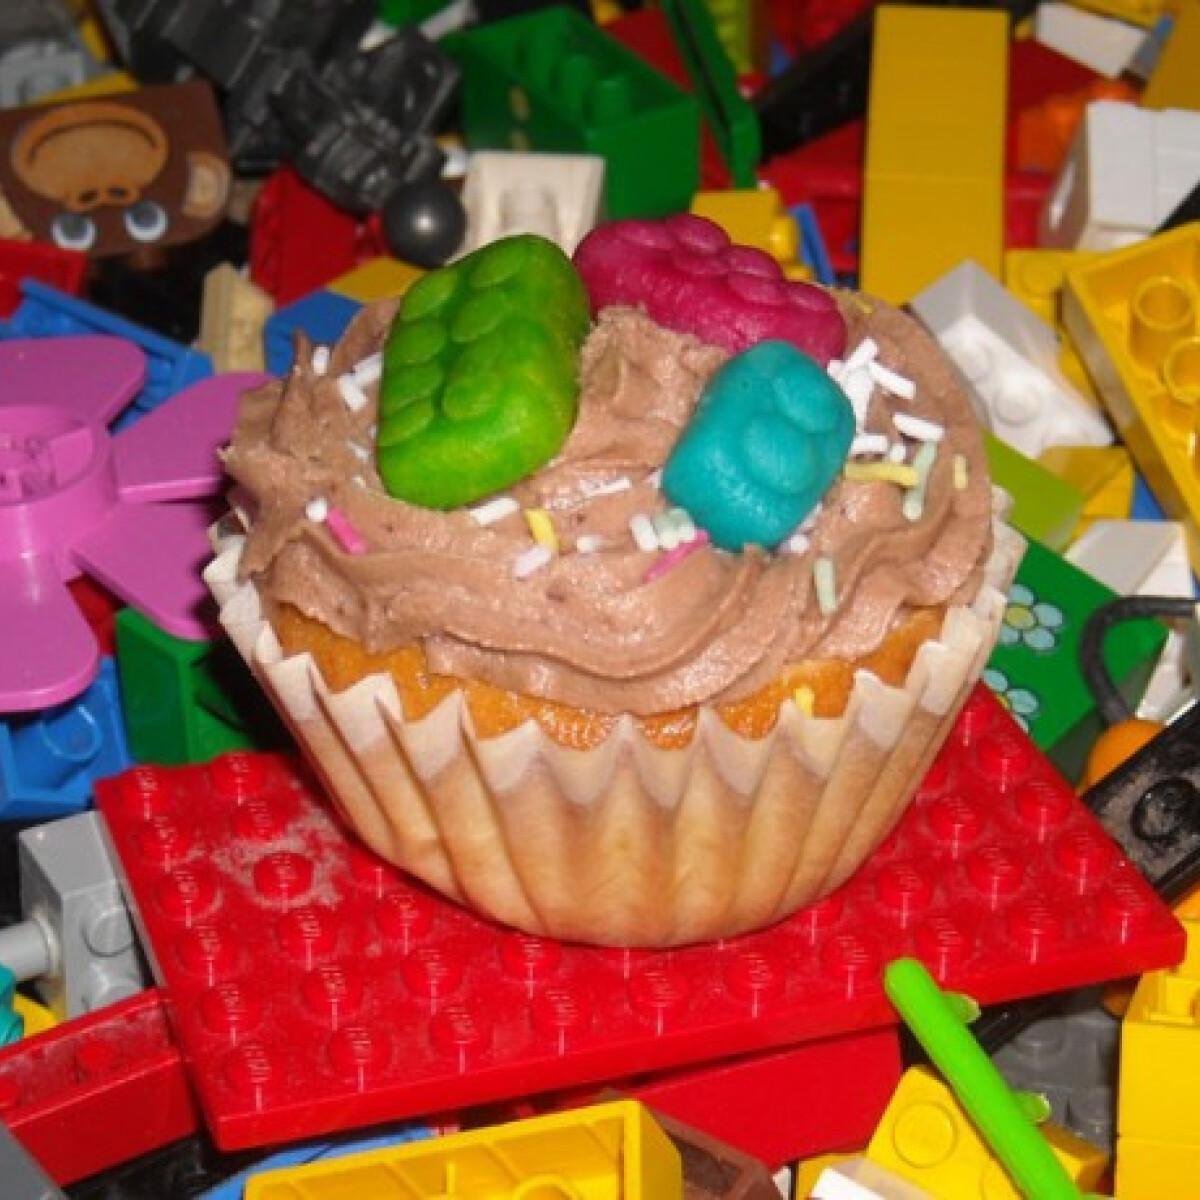 Ezen a képen: Lego muffin